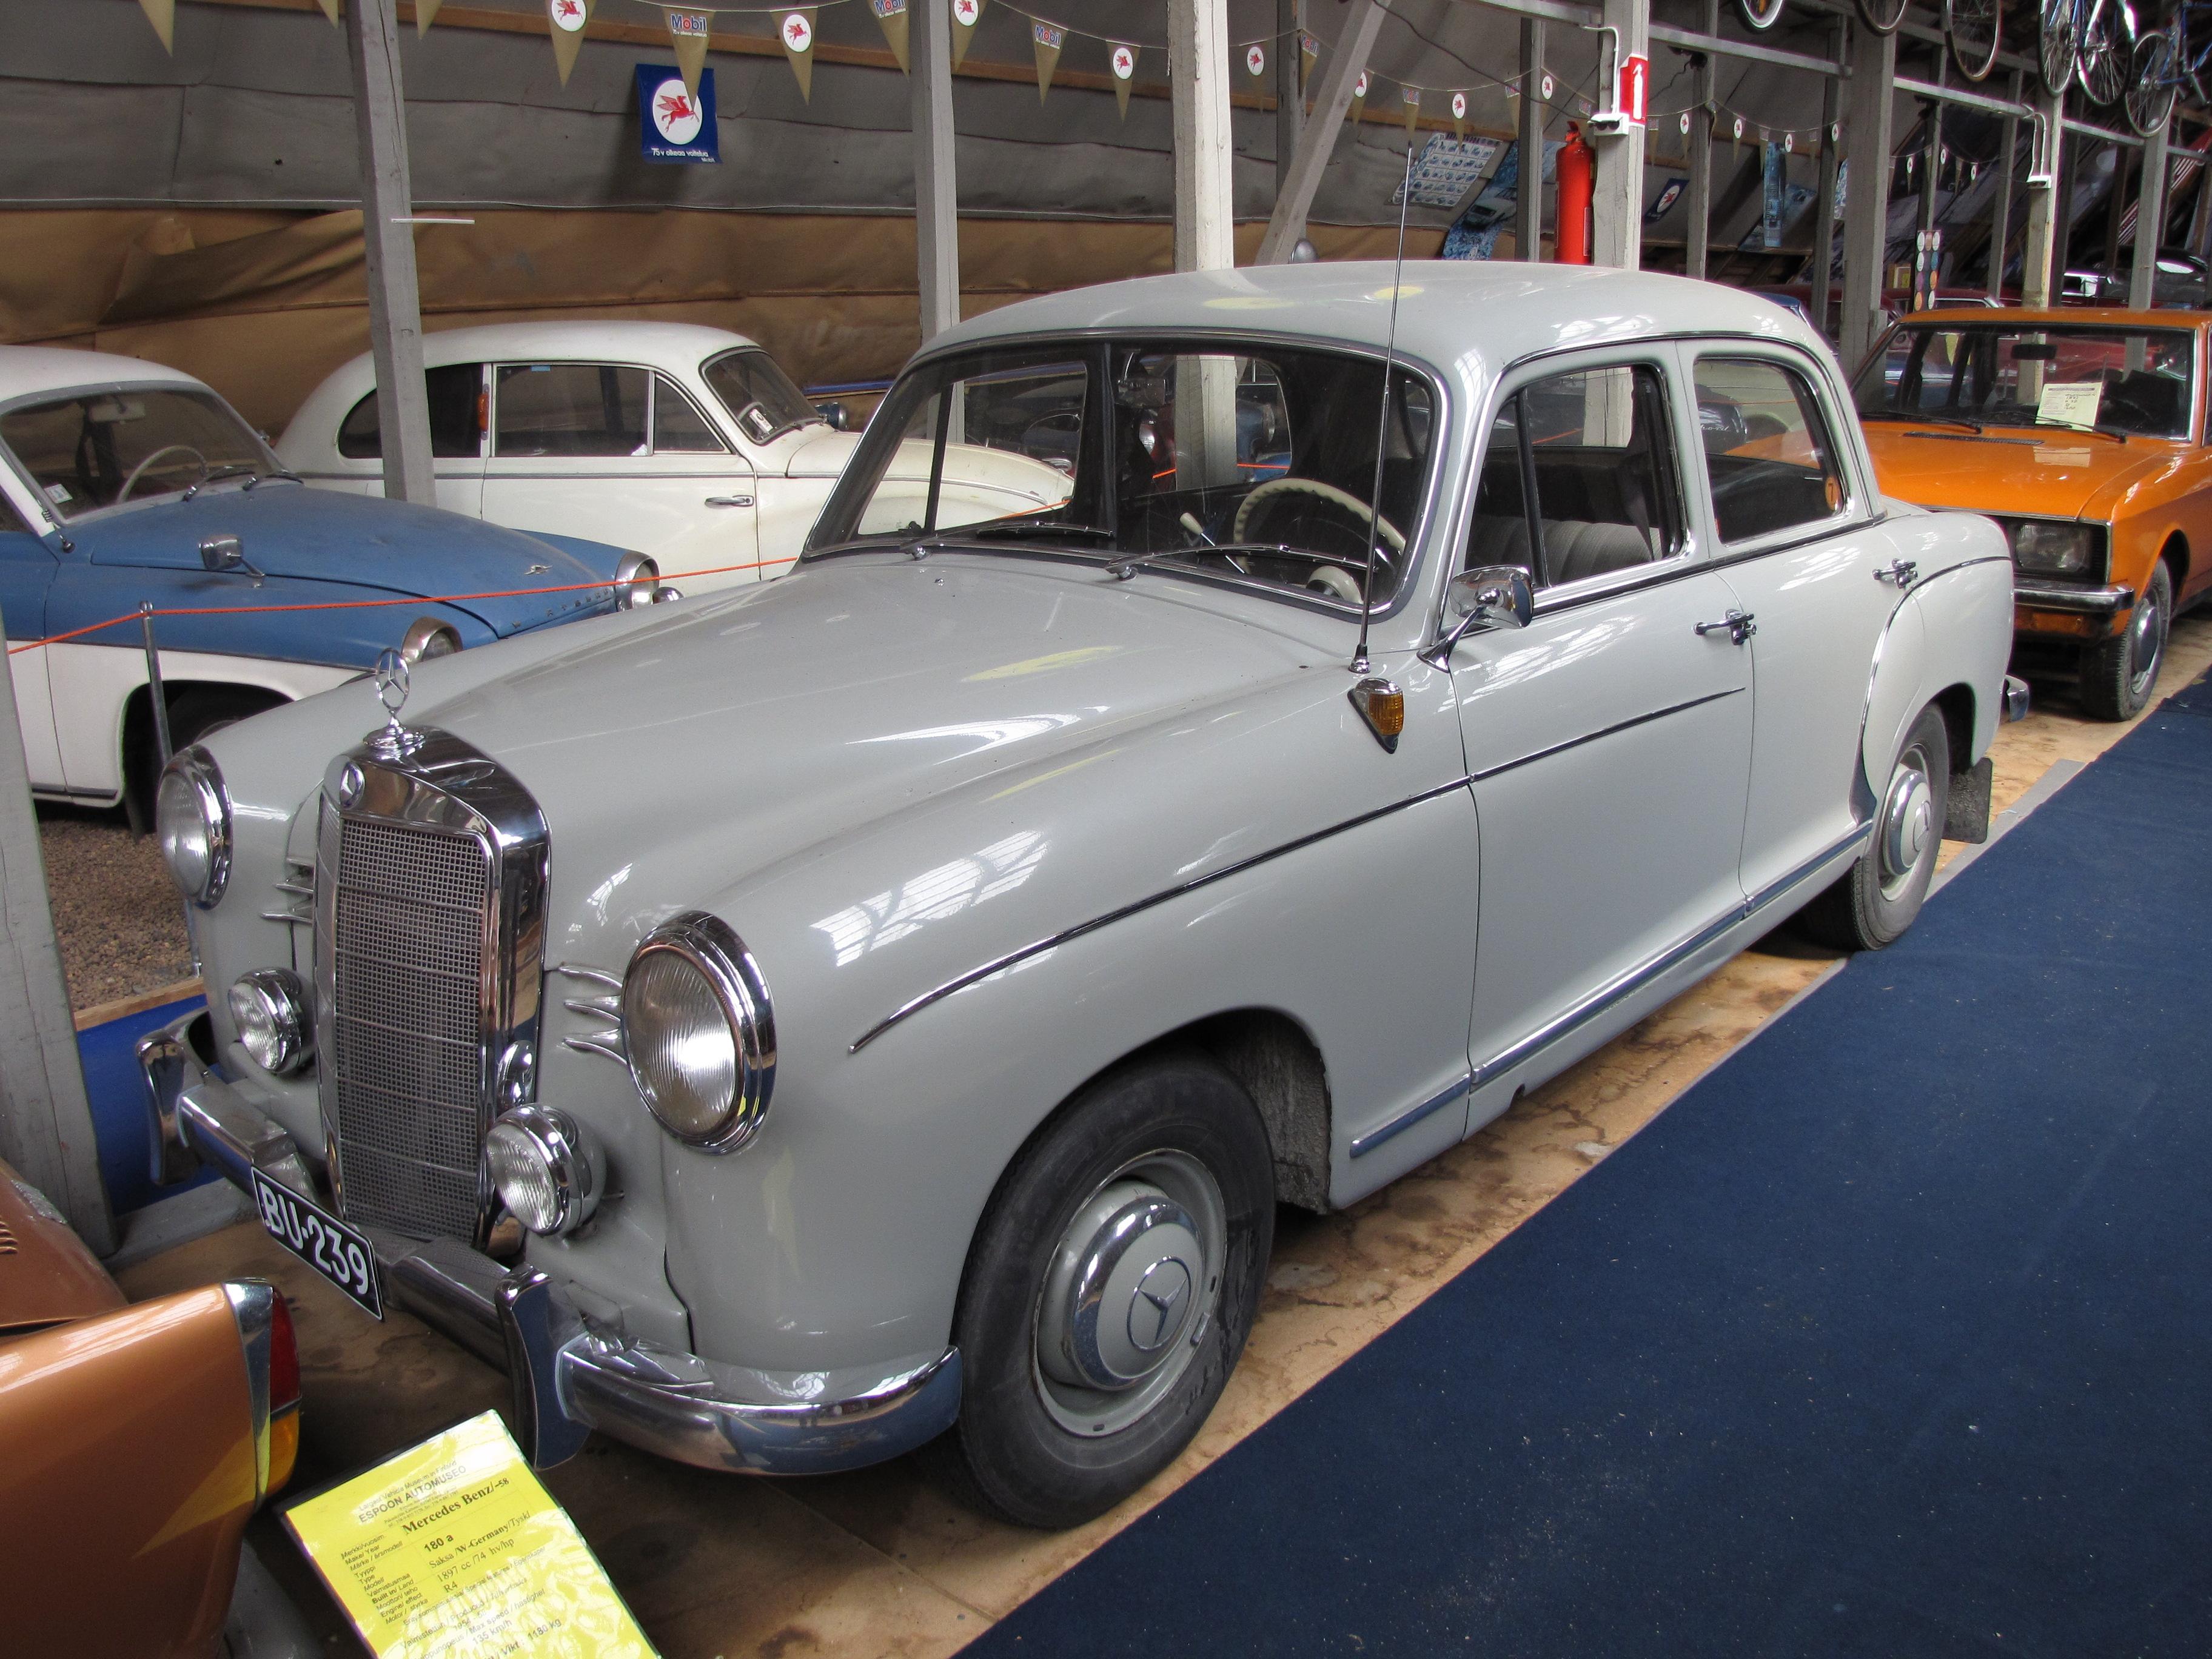 Mercedes Benz History Of Models >> File:Mercedes-Benz 180a model 1958 front.JPG - Wikimedia ...